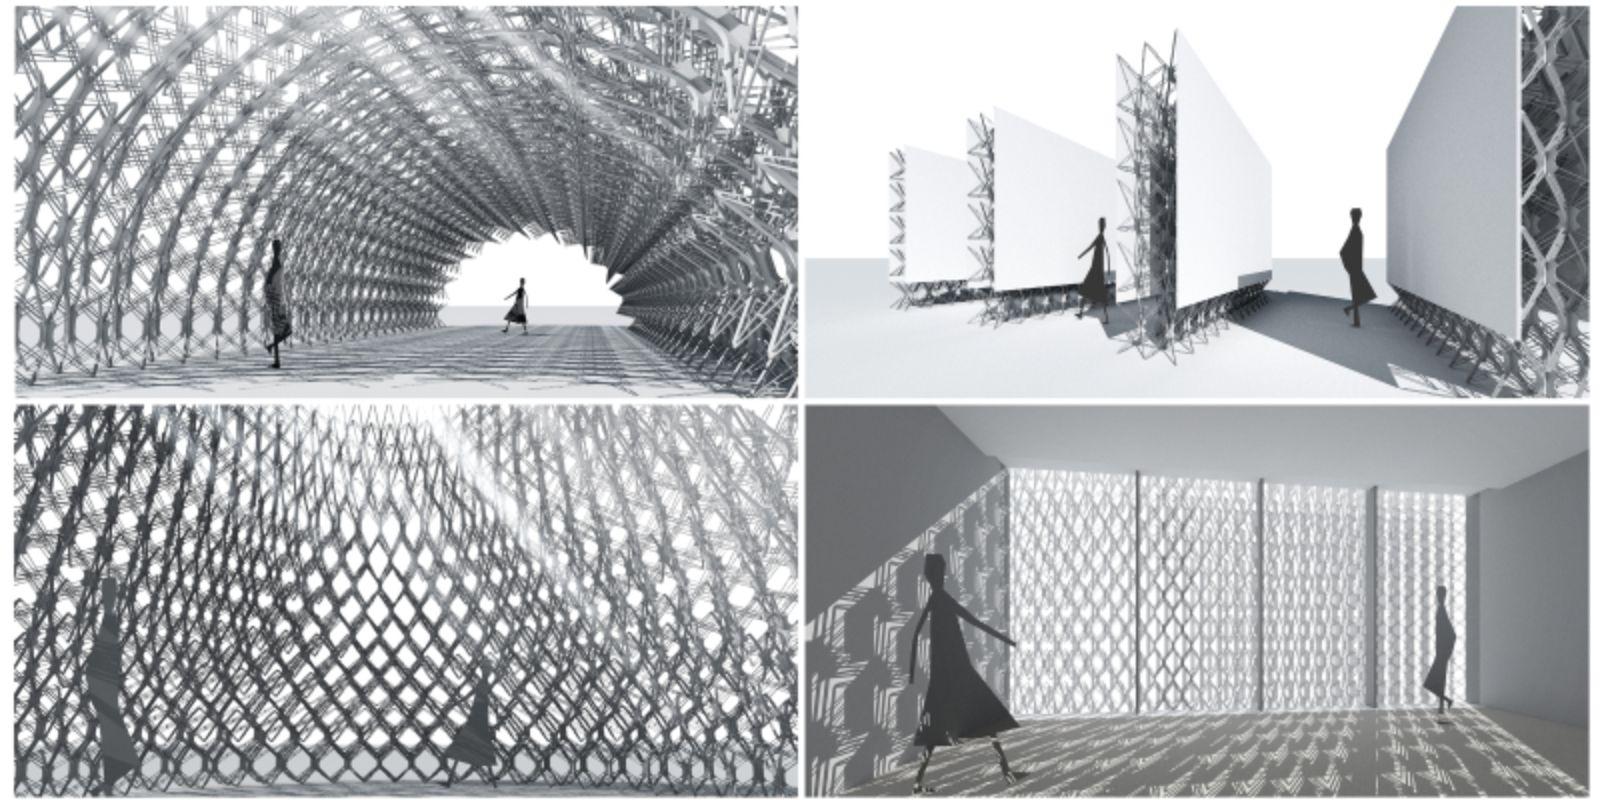 Design that Educates Awards